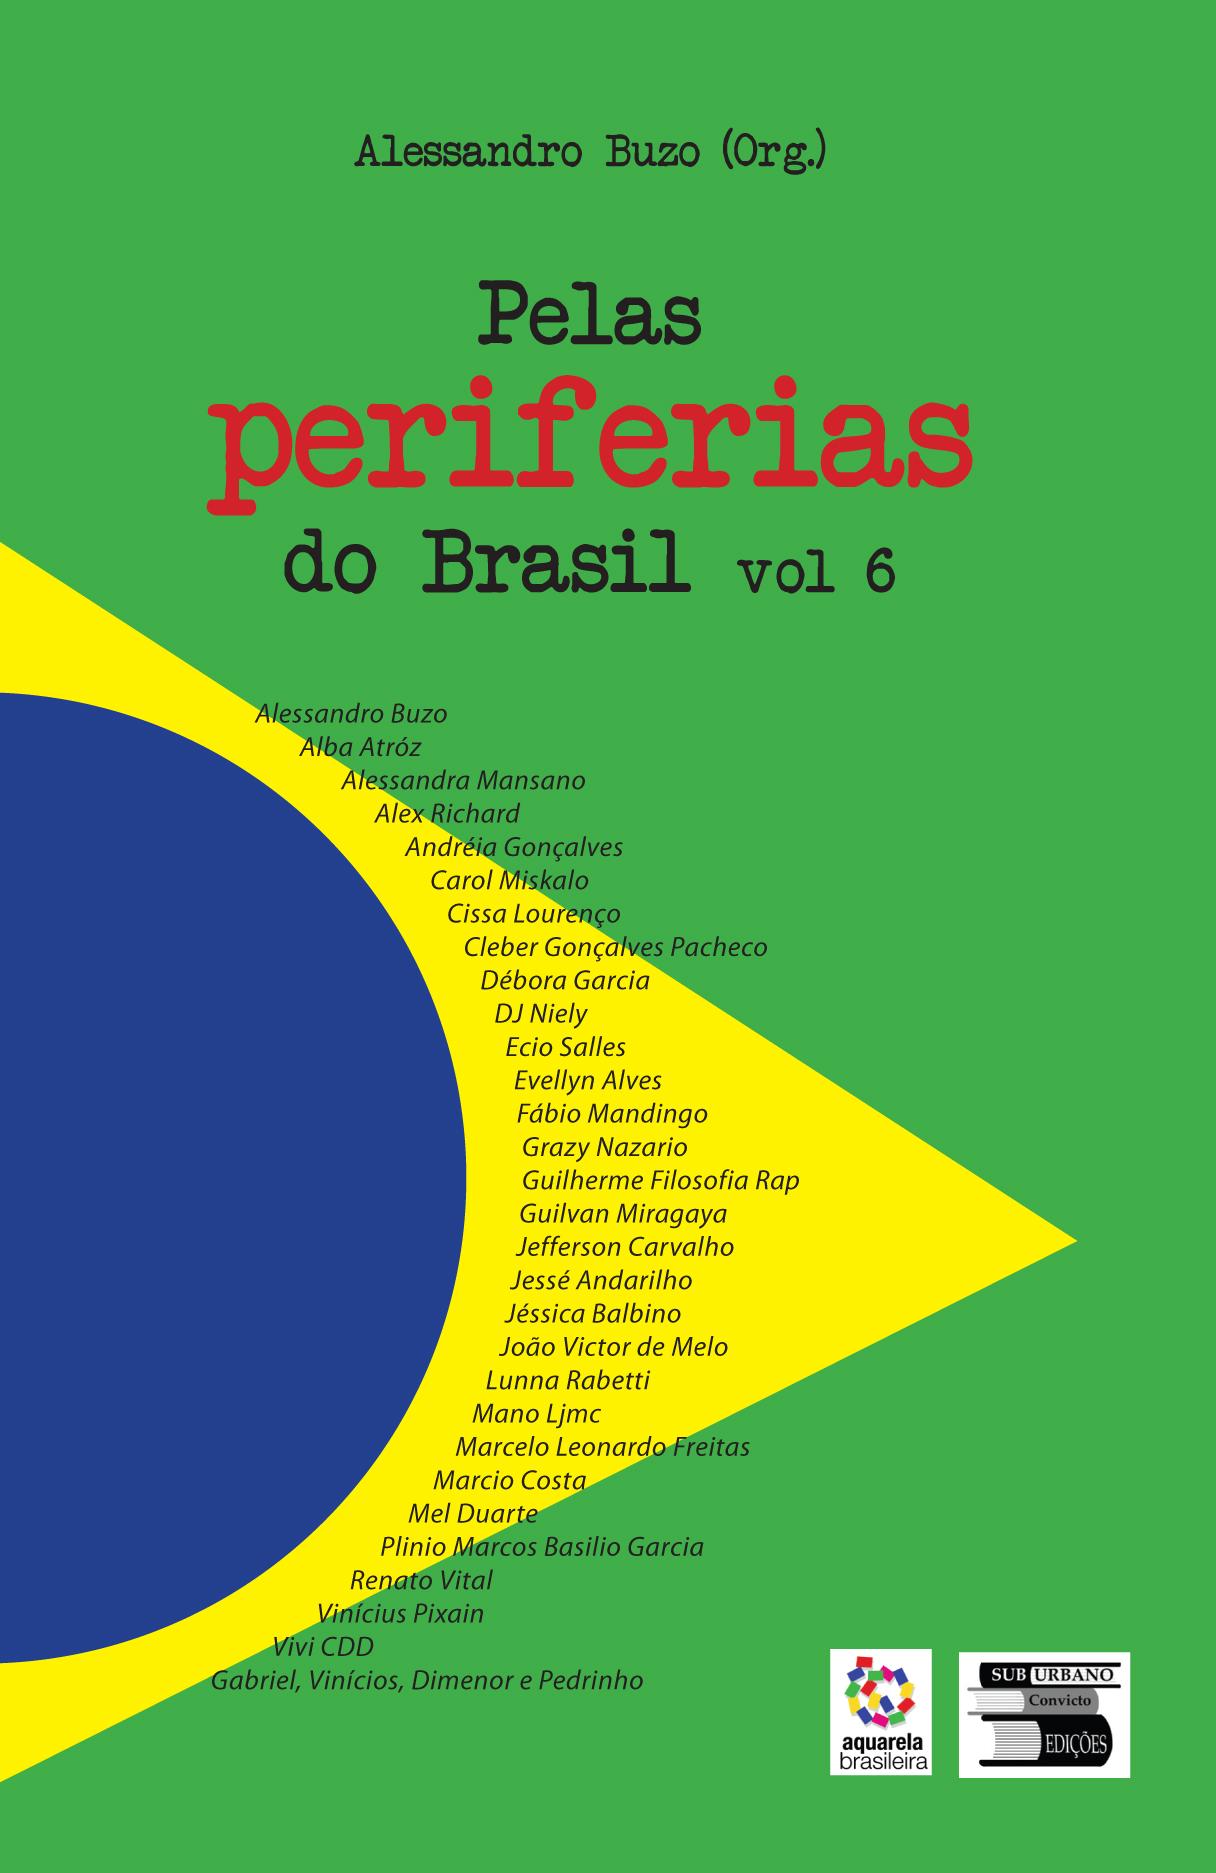 pelas-periferias-do-brasil-vol-6_capa-promo